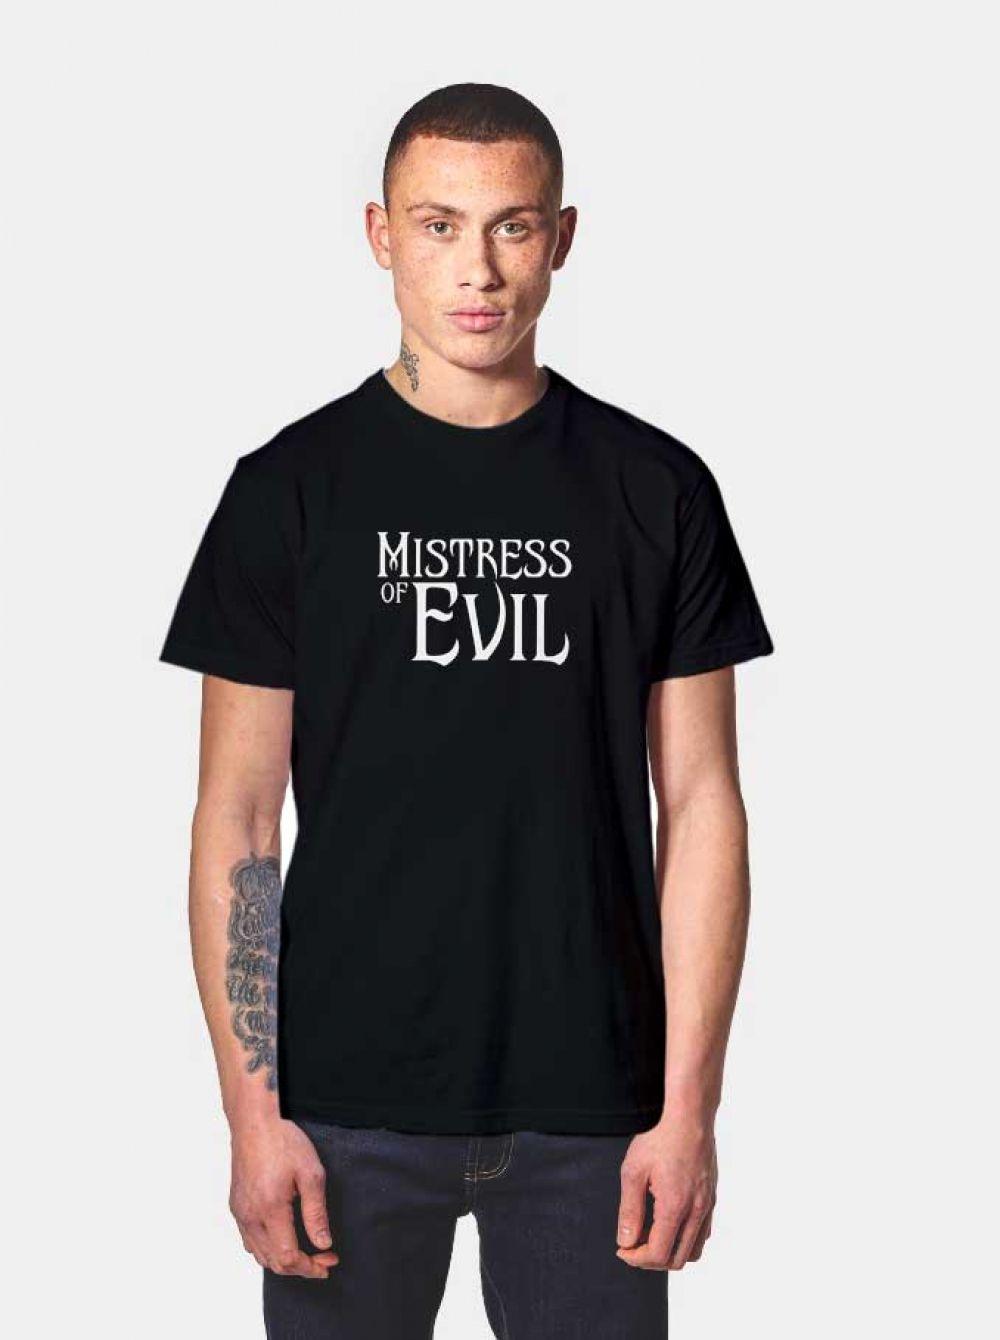 Mistress of Evil T Shirt Mistress of Evil T Shirt $ 14.50